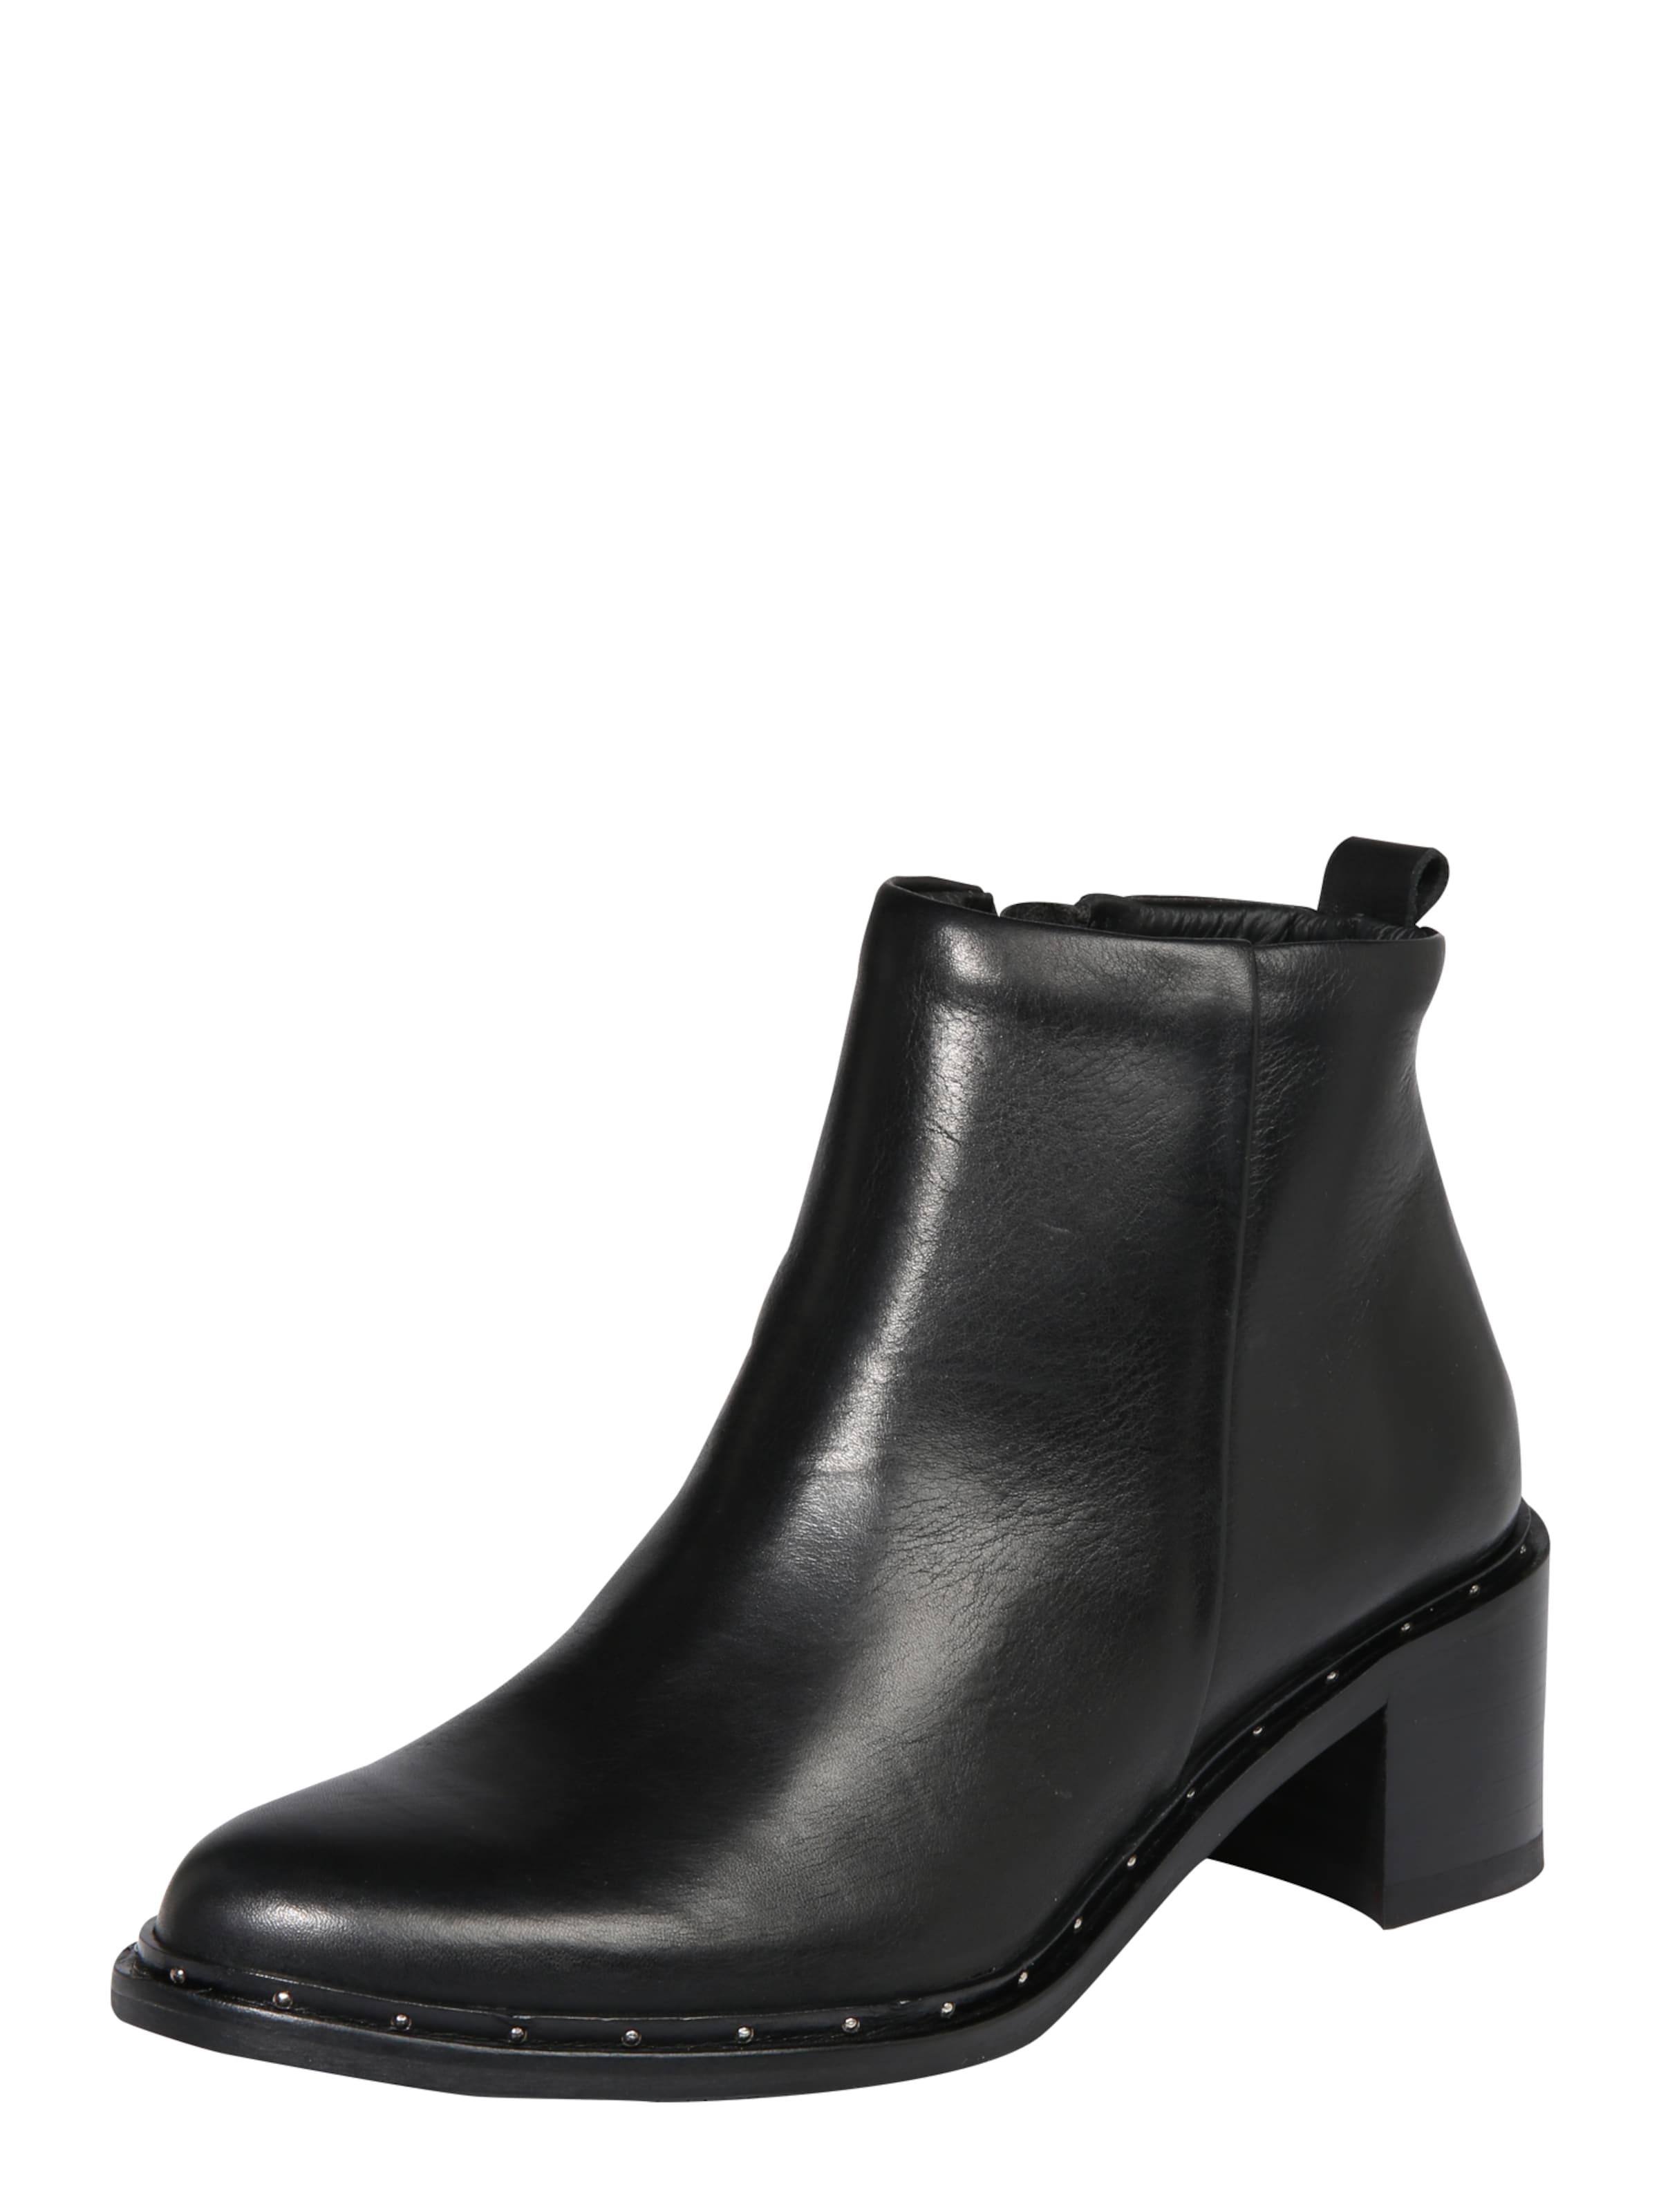 ROYAL Stiefeletten REPUBLIQ Stiefeletten ROYAL Town Verschleißfeste billige Schuhe 1d7c2d